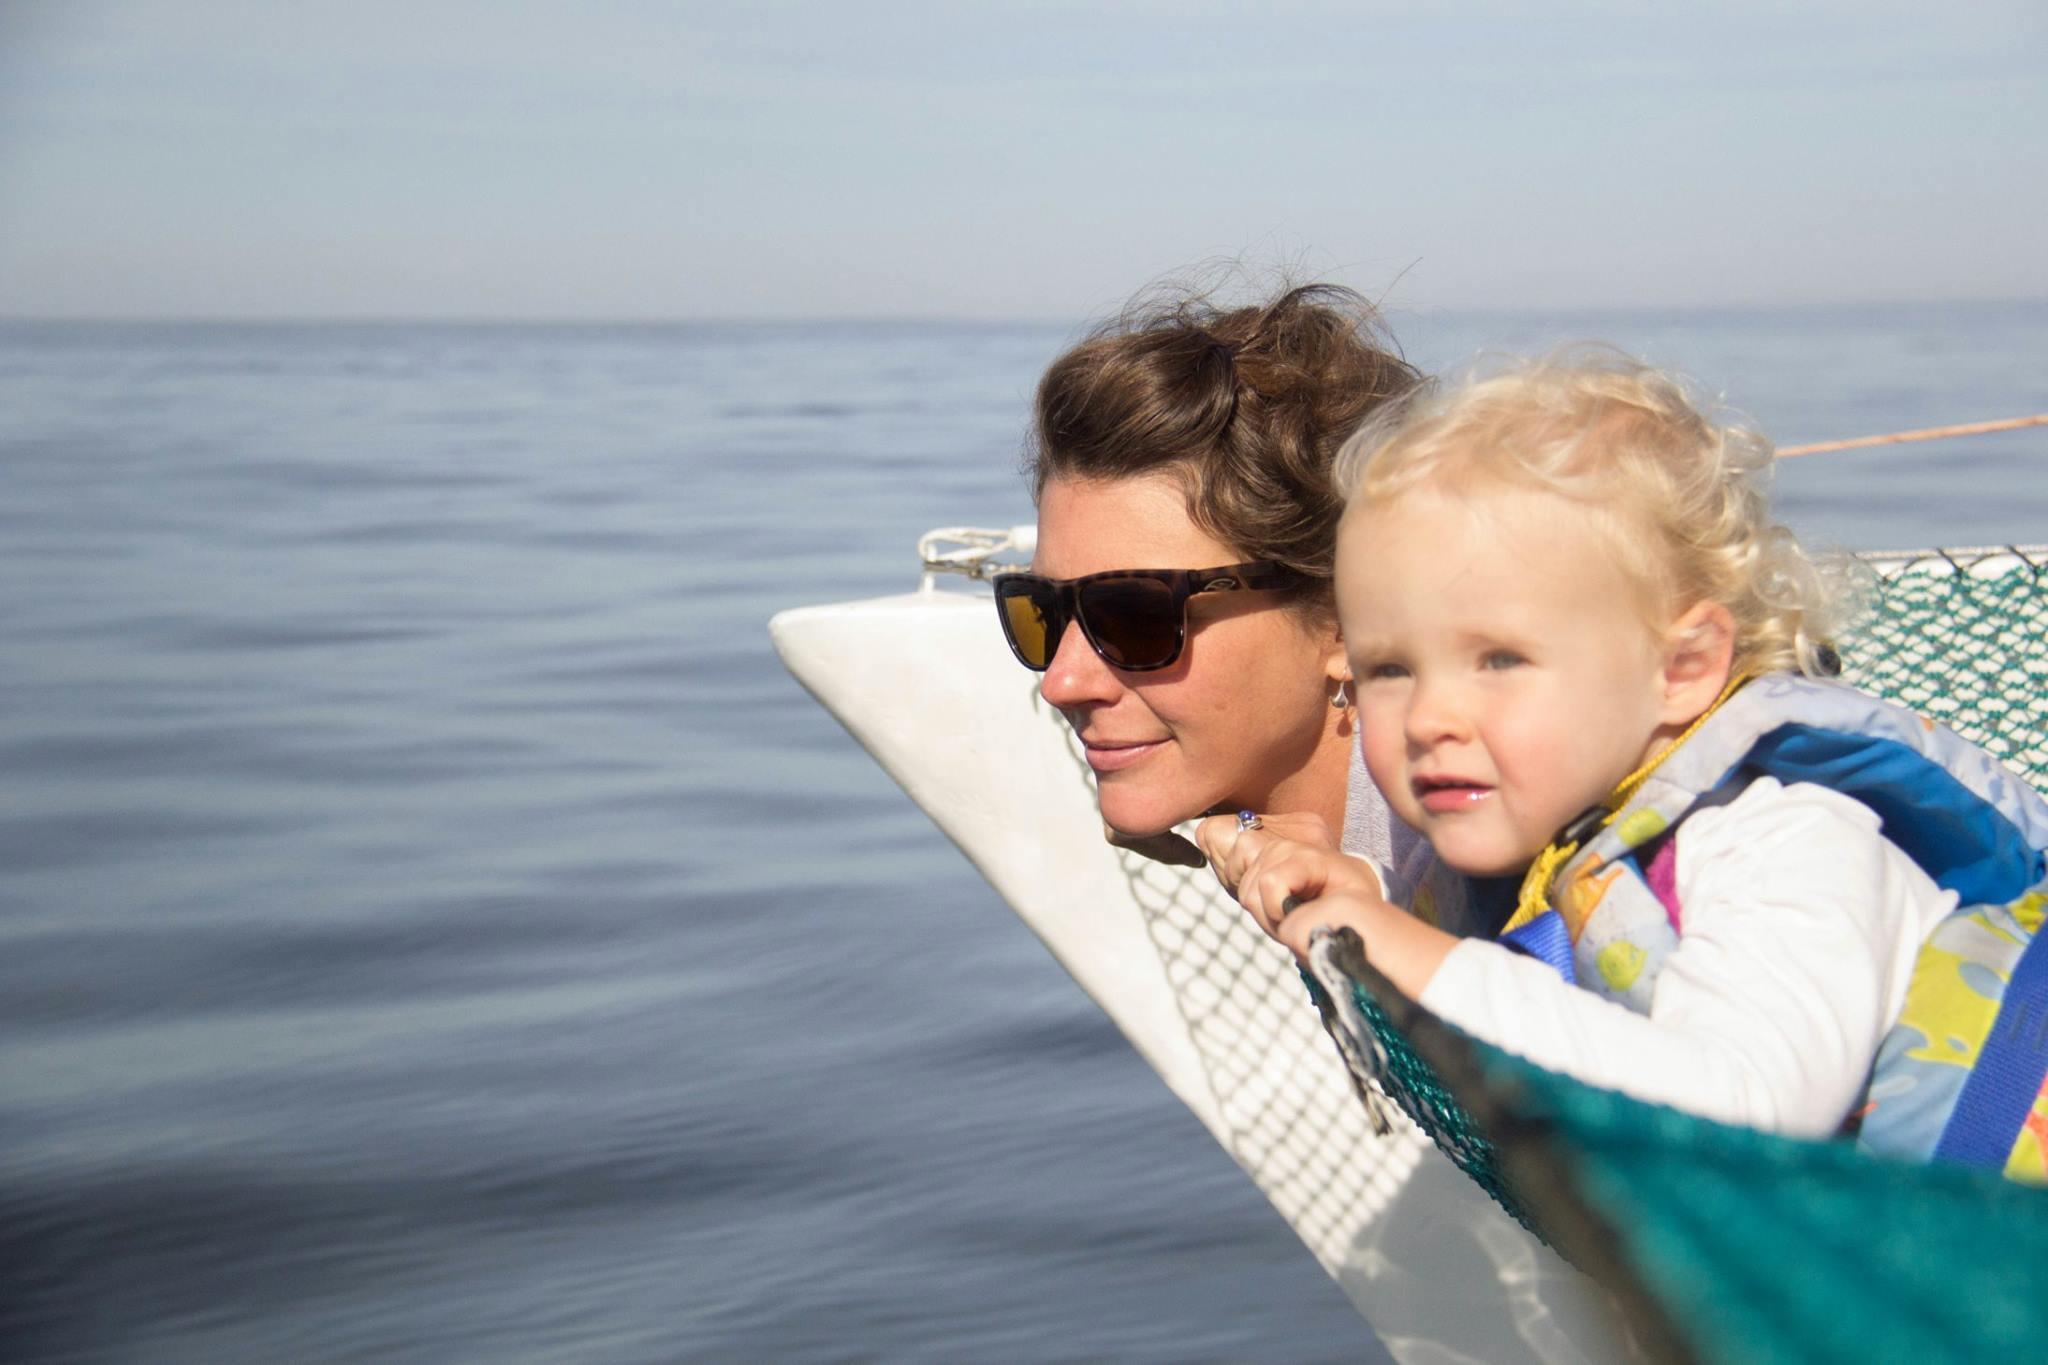 Sirens of the sea, Ashley & Ani (photo courtesy of Ren Chapman)